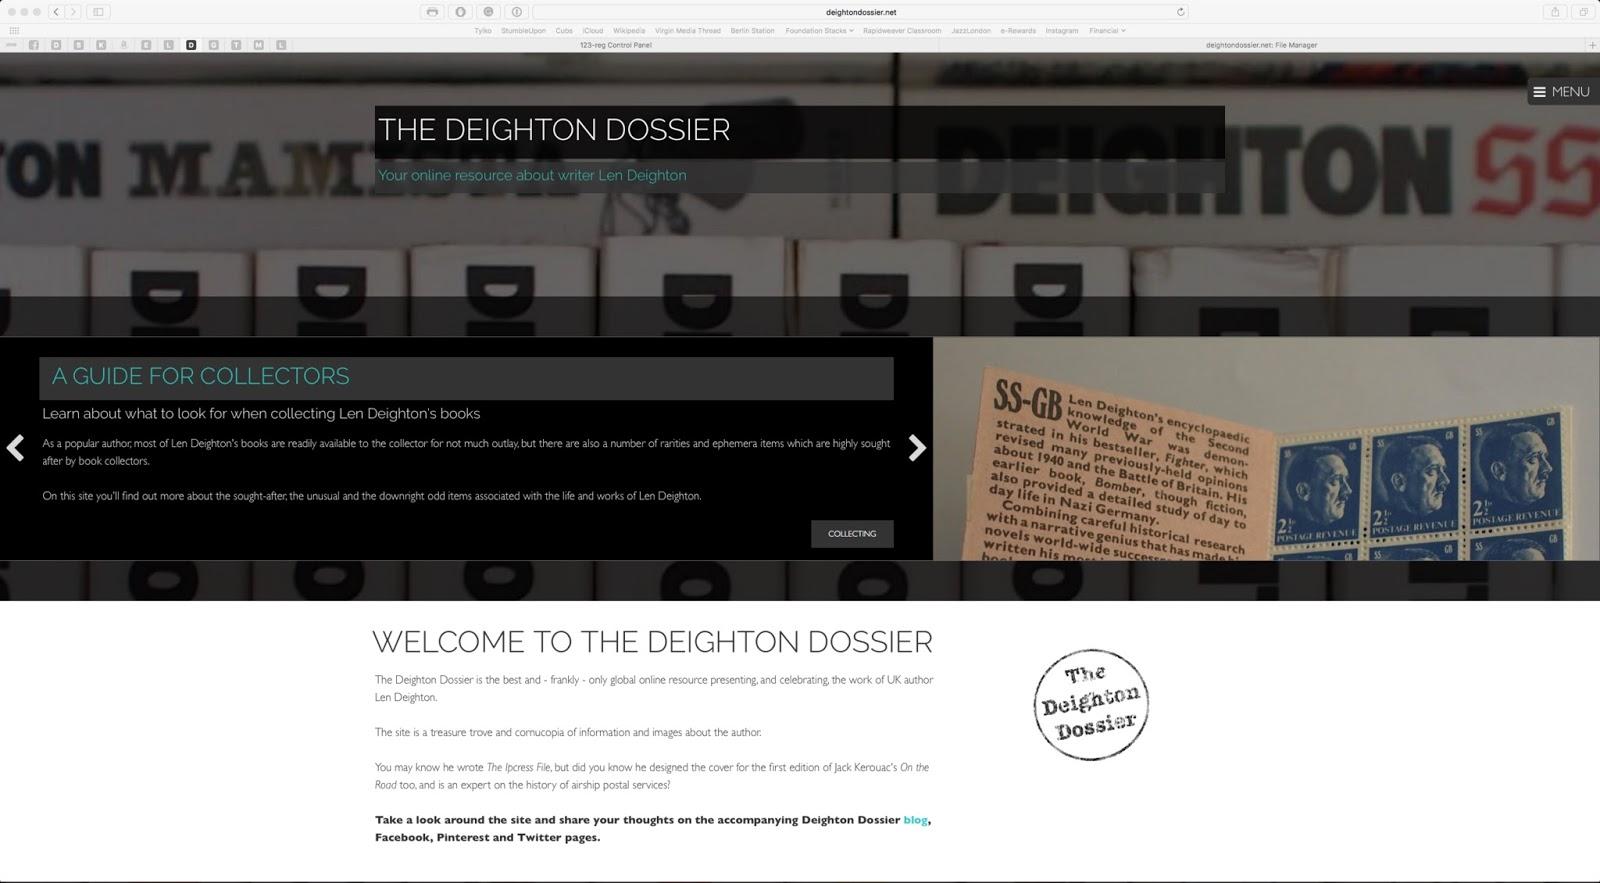 custom term paper editor website gb